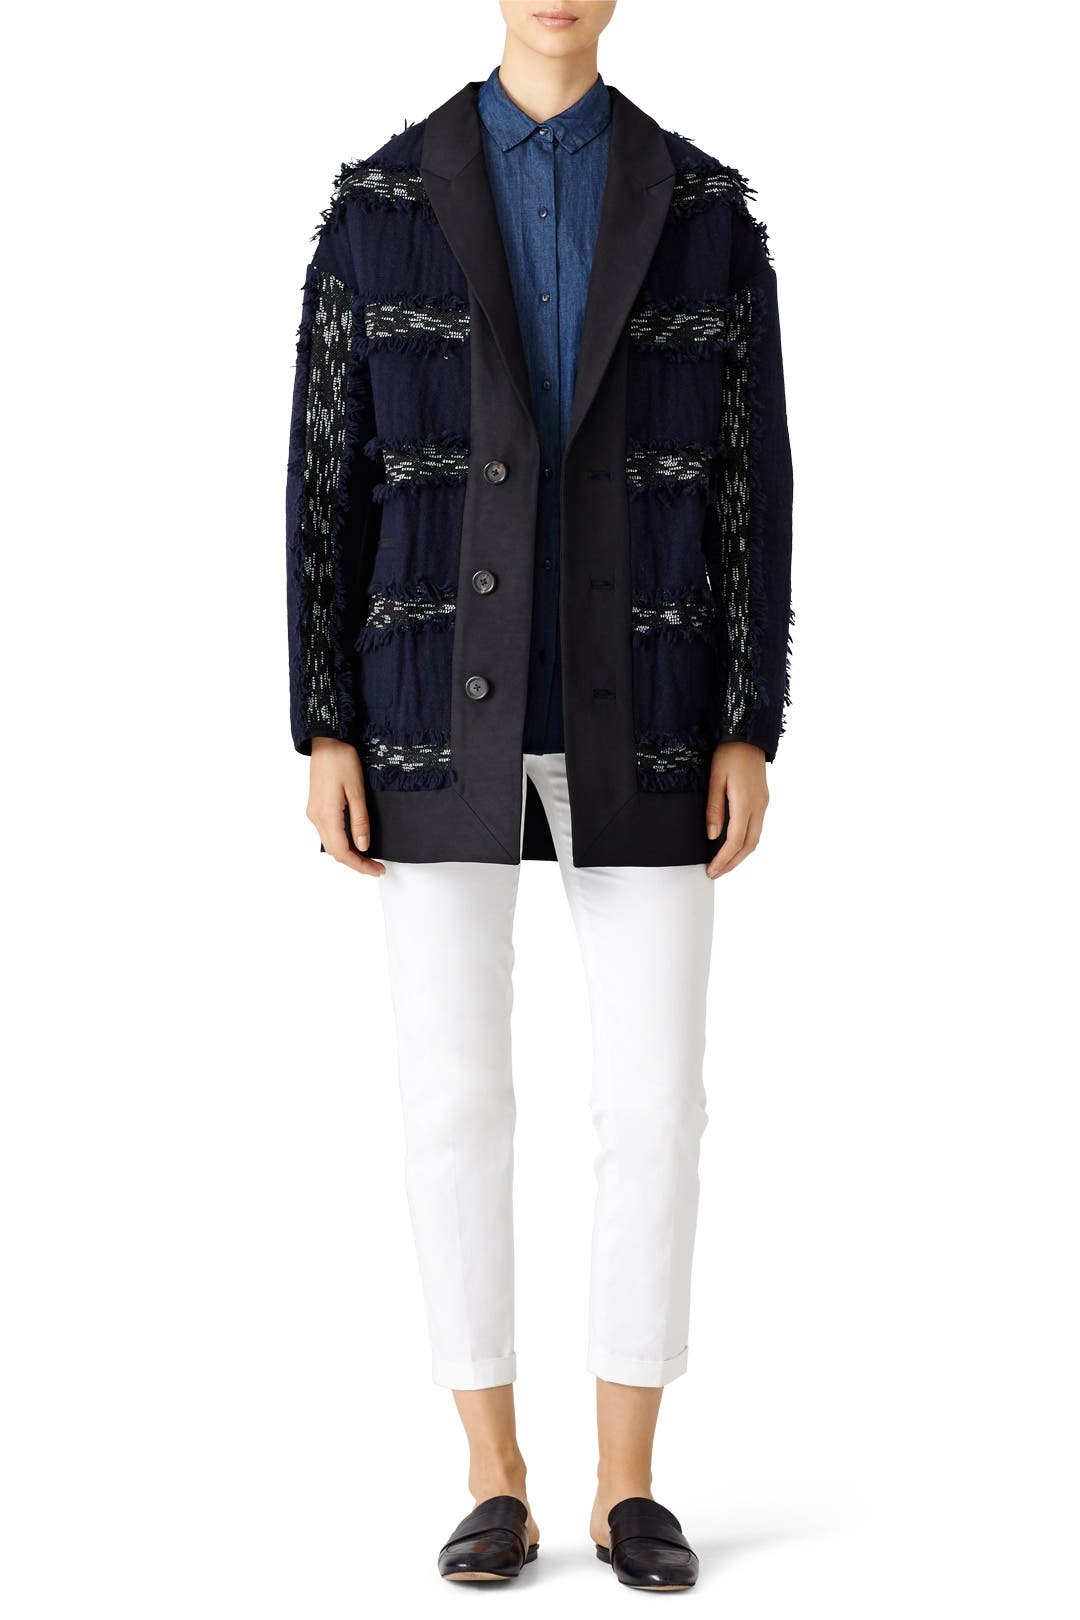 Derek Lam 10 Crosby Midnight Stripe Fringe Jacket